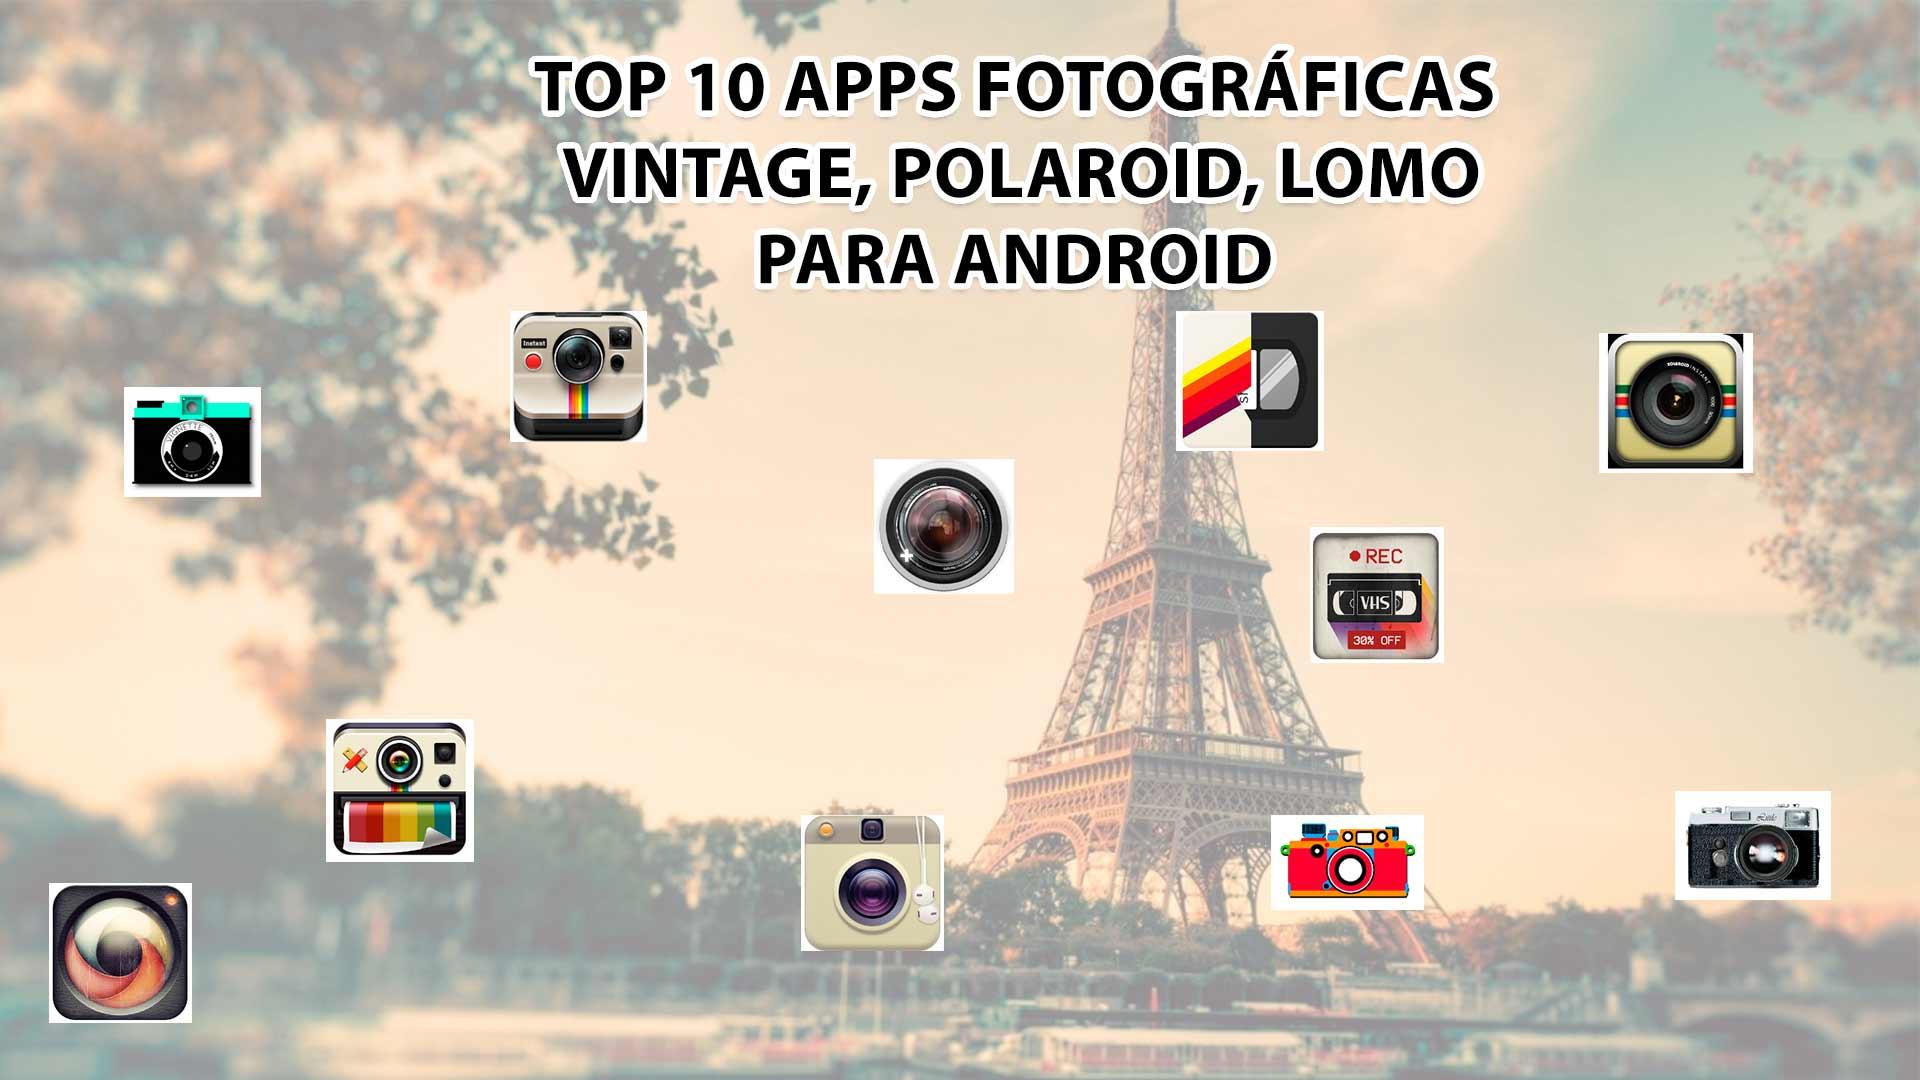 TOP 10 APPS FOTOGRÁFICAS VINTAGE, POLAROID,LOMO